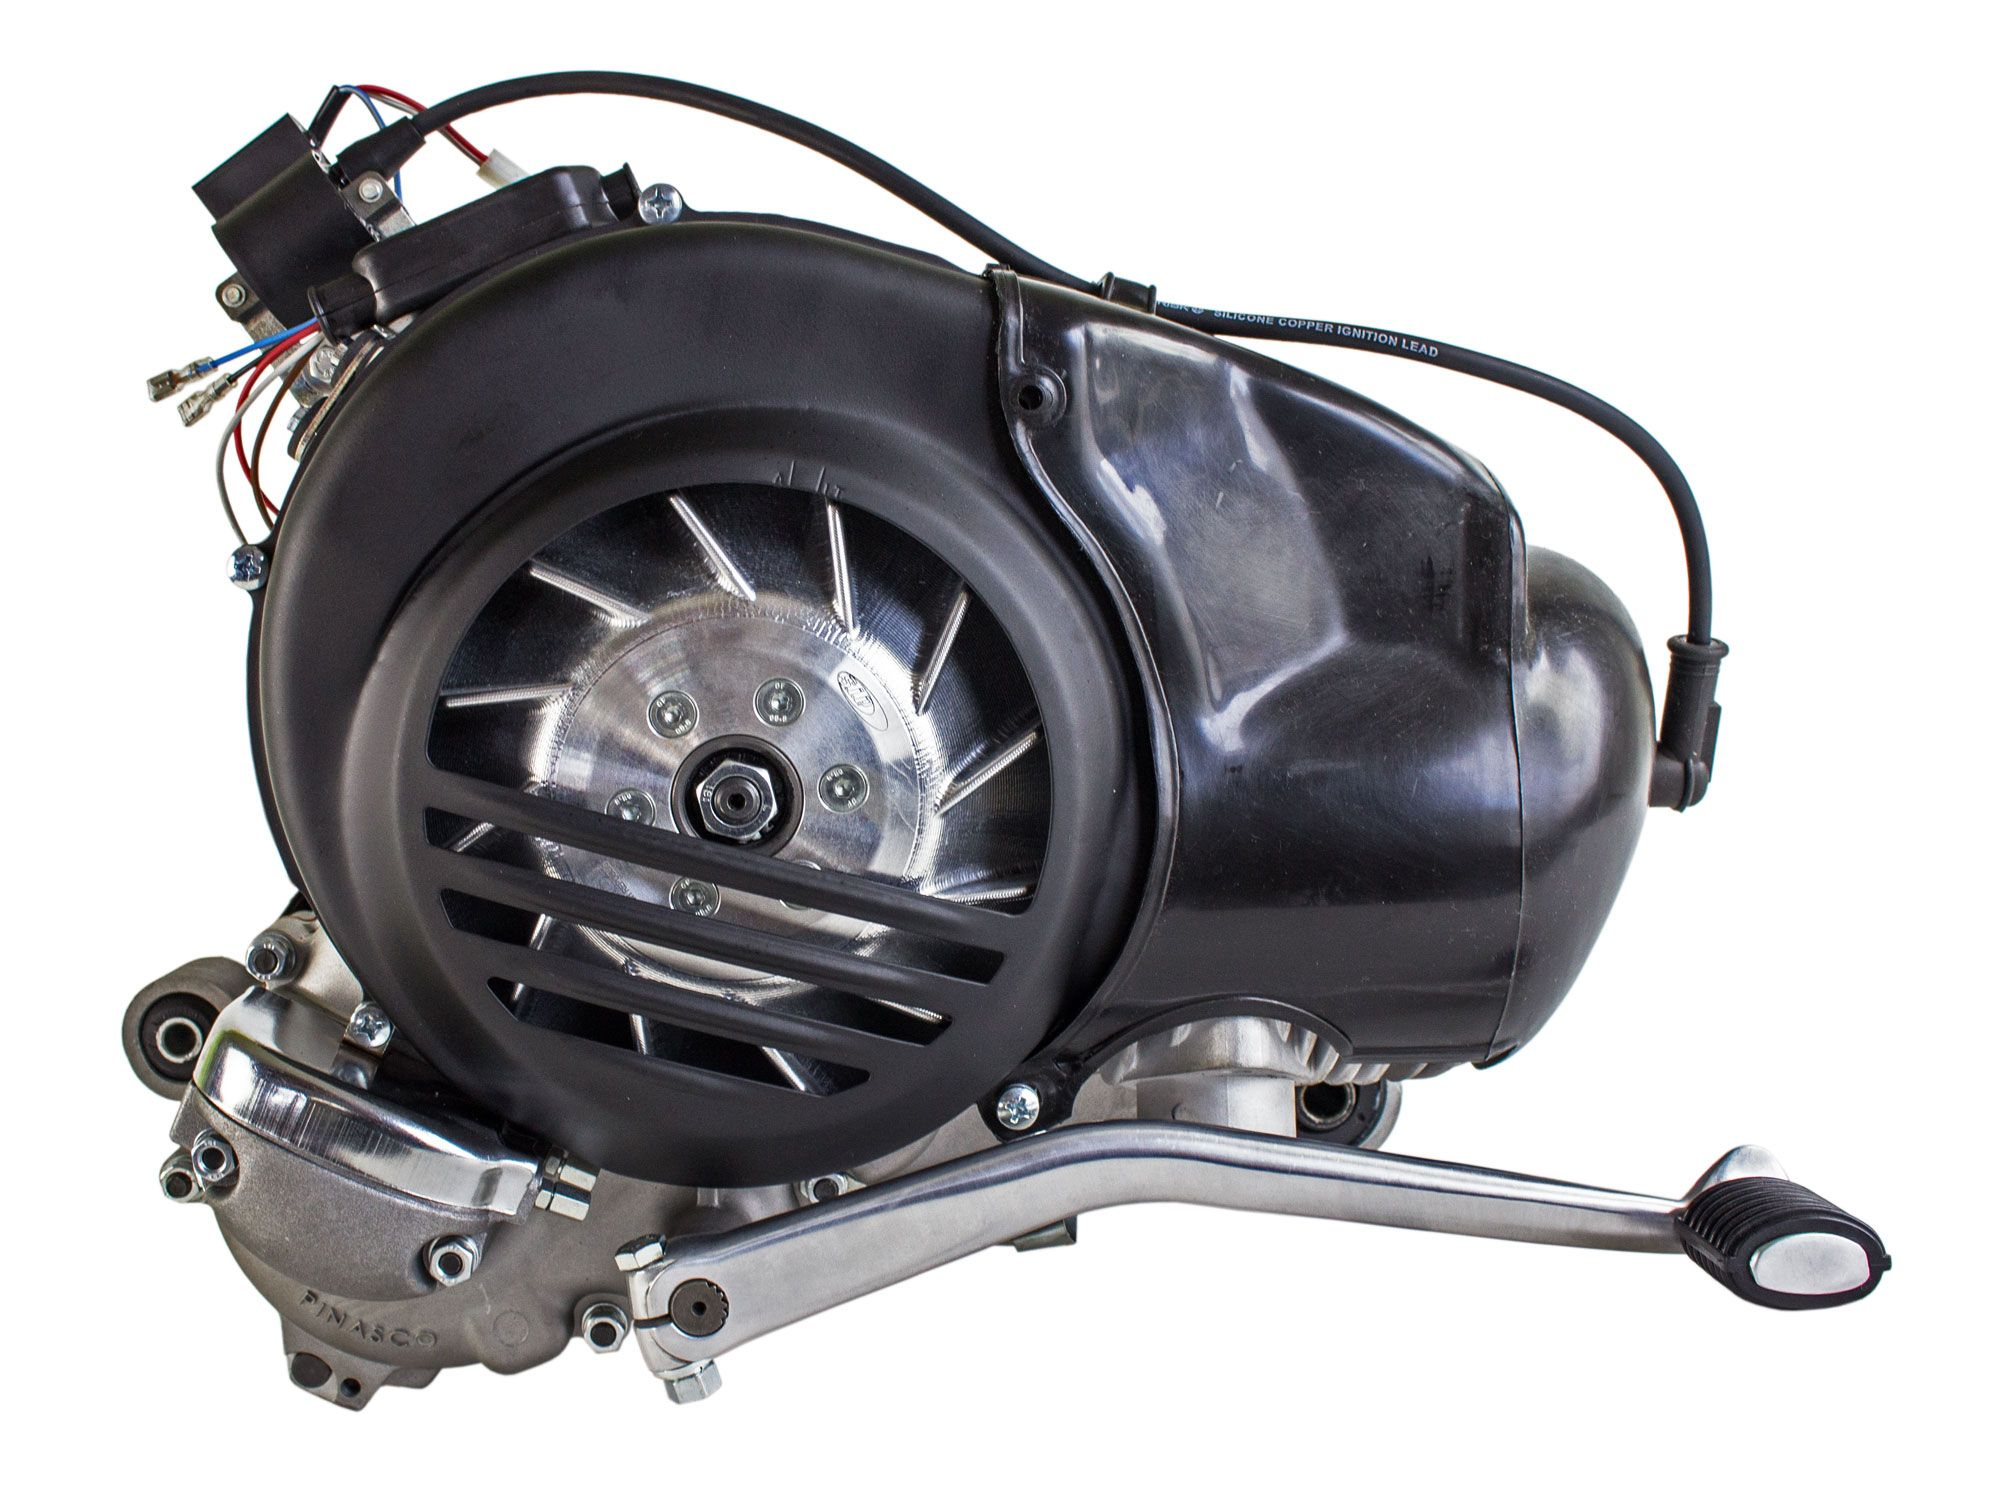 Motor Vespa Px 200 Quattrini 244 260ccm Vespa Px 200 Vespa